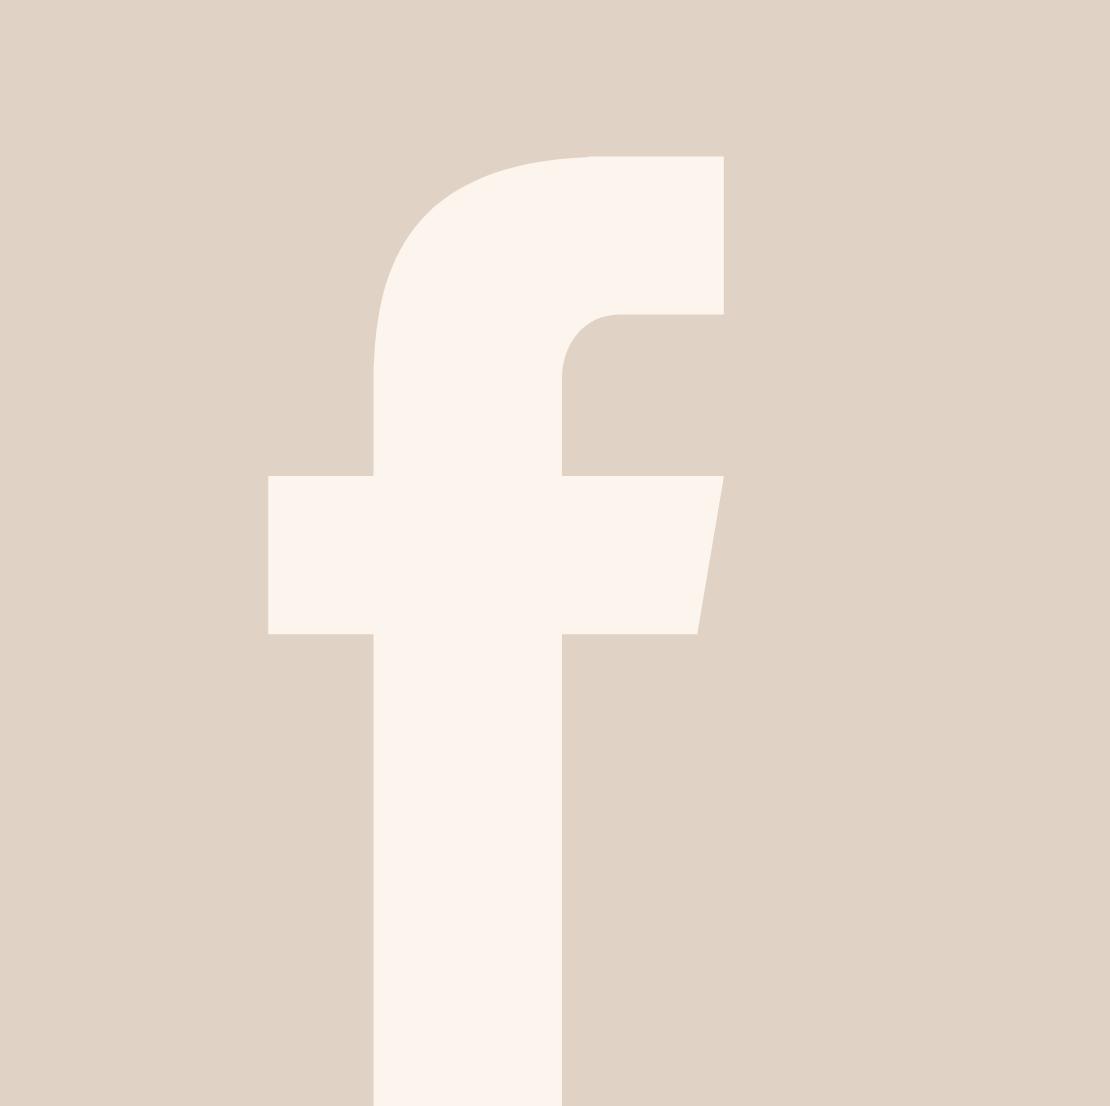 Facebook Icon Android App Icon Iphone Photo App App Icon